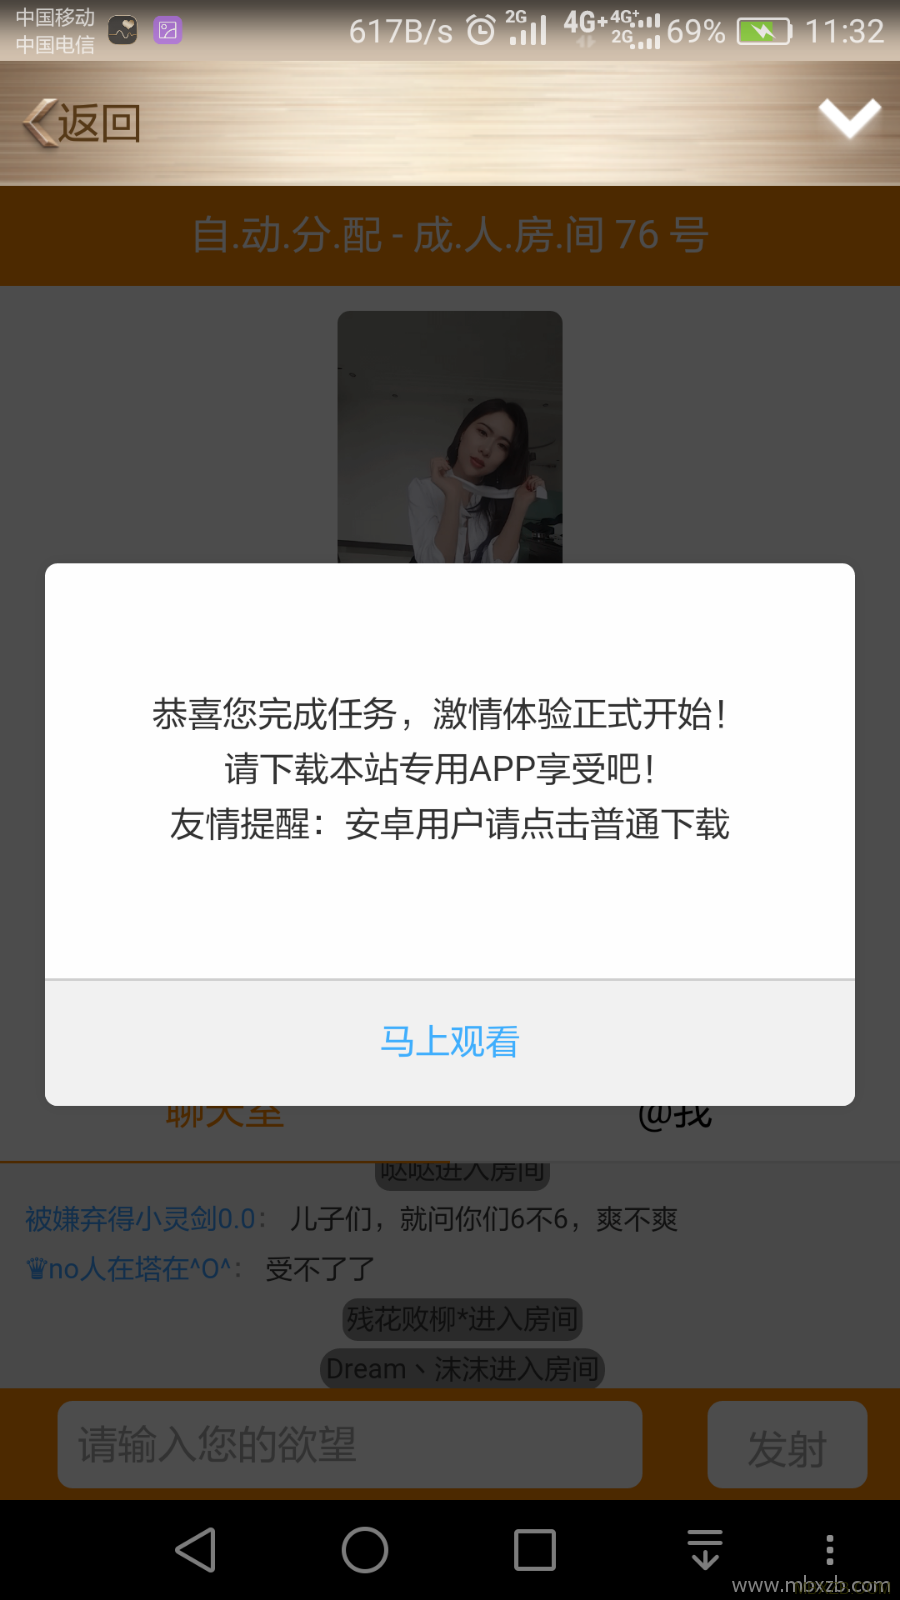 QQ群强制分享,引流源码,引流,分裂,日引流上千,没有你打我。(活动打折中)